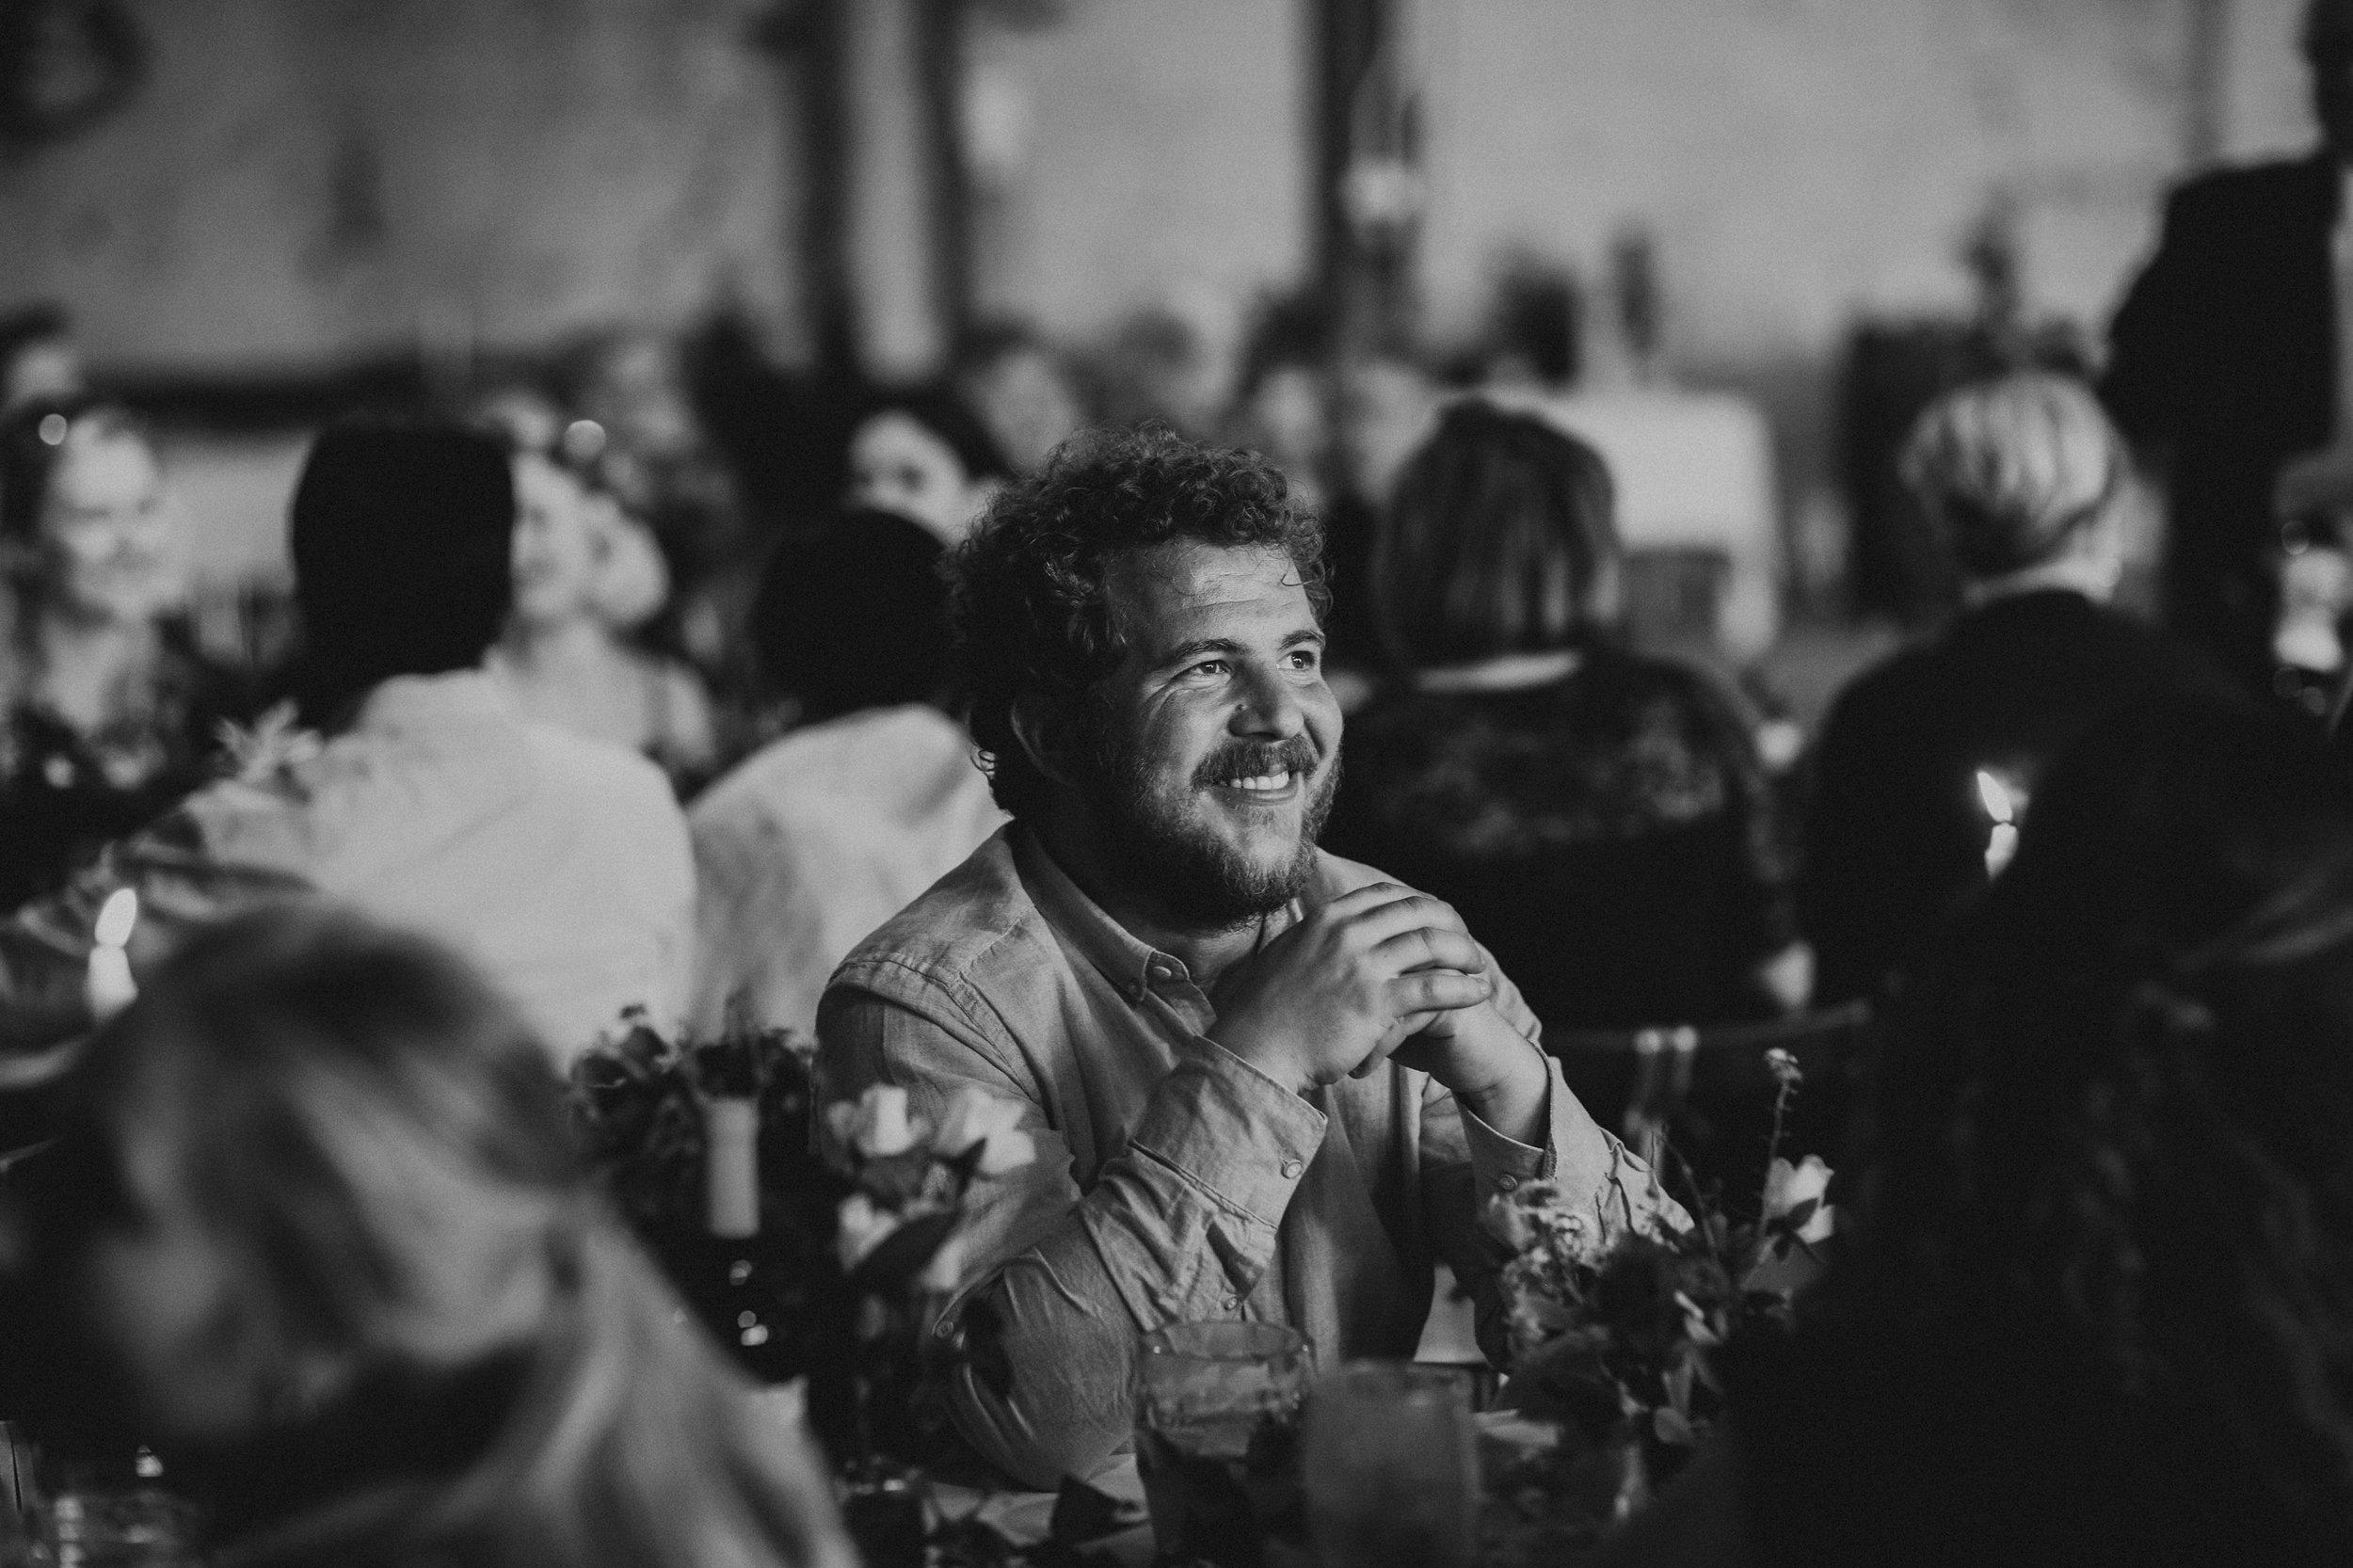 COMRIE_CROFT_WEDDINGS_PJ_PHILLIPS_PHOTOGRAPHY_146.jpg